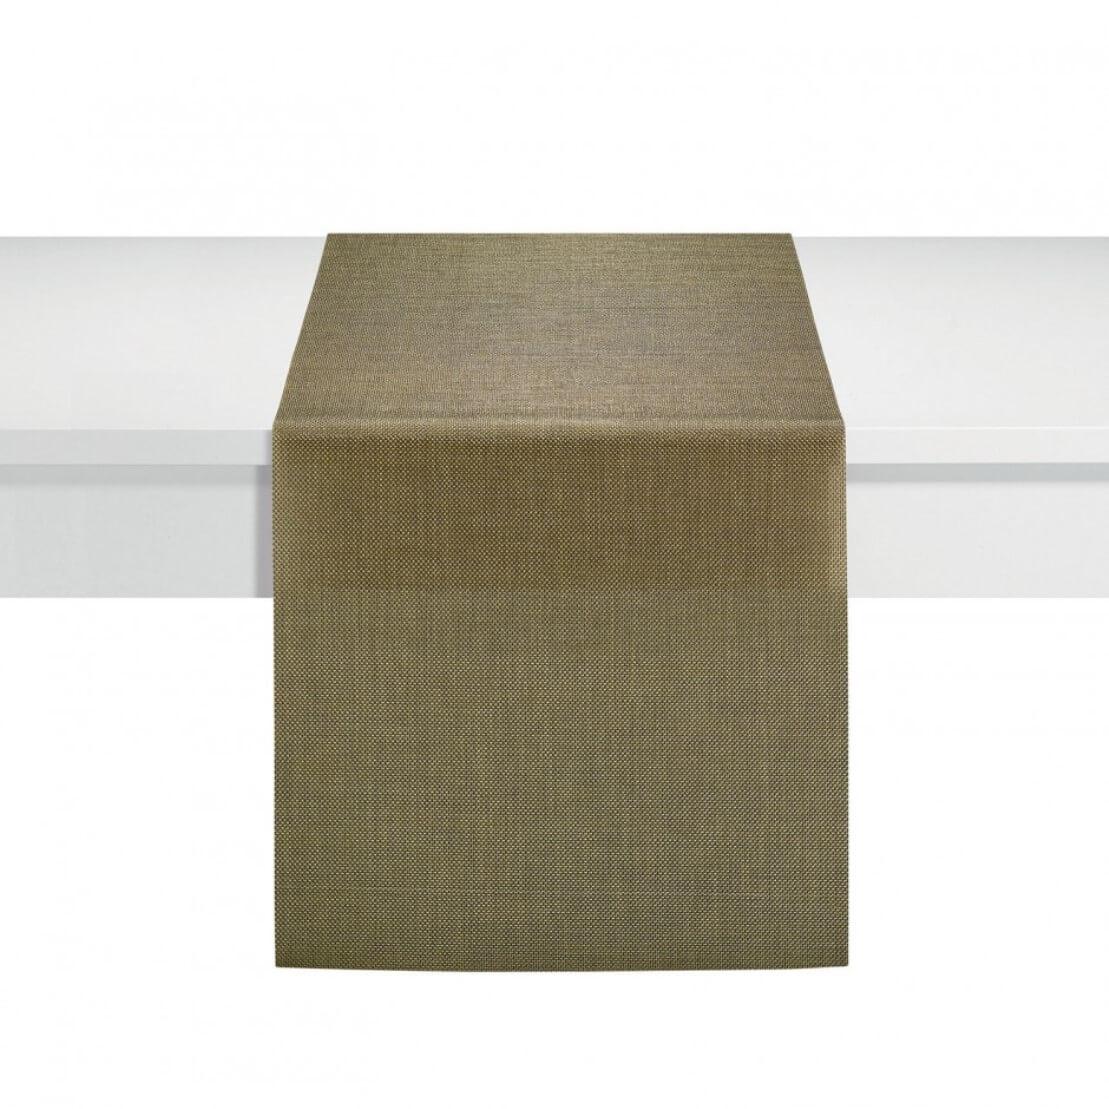 Онлайн каталог PROMENU: Дорожка на стол Winkler Lina, 45х150 см, бронзовая                                   3488085000